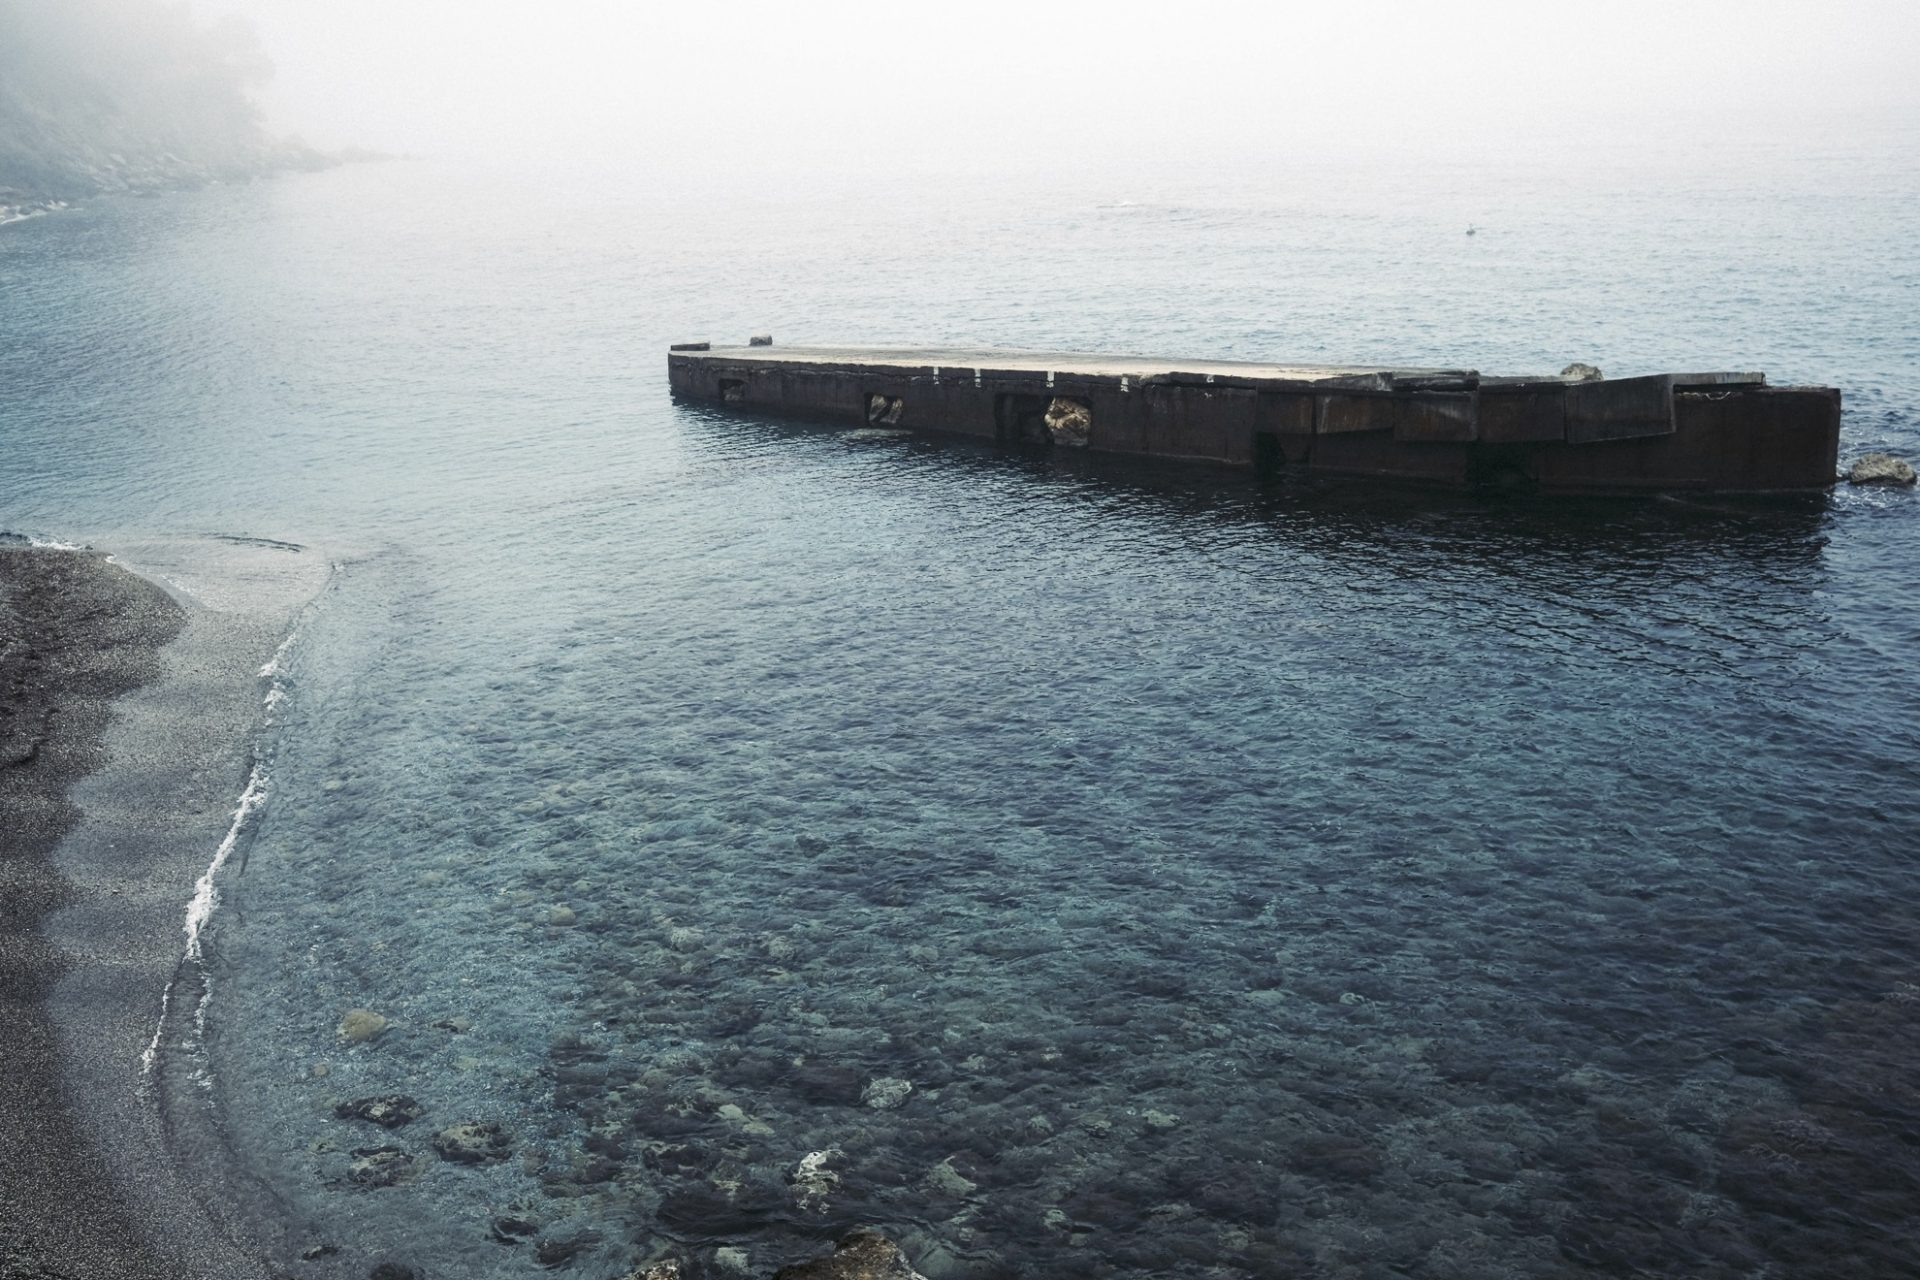 Fuji X100v pin de galle fog @laurentparienti-8